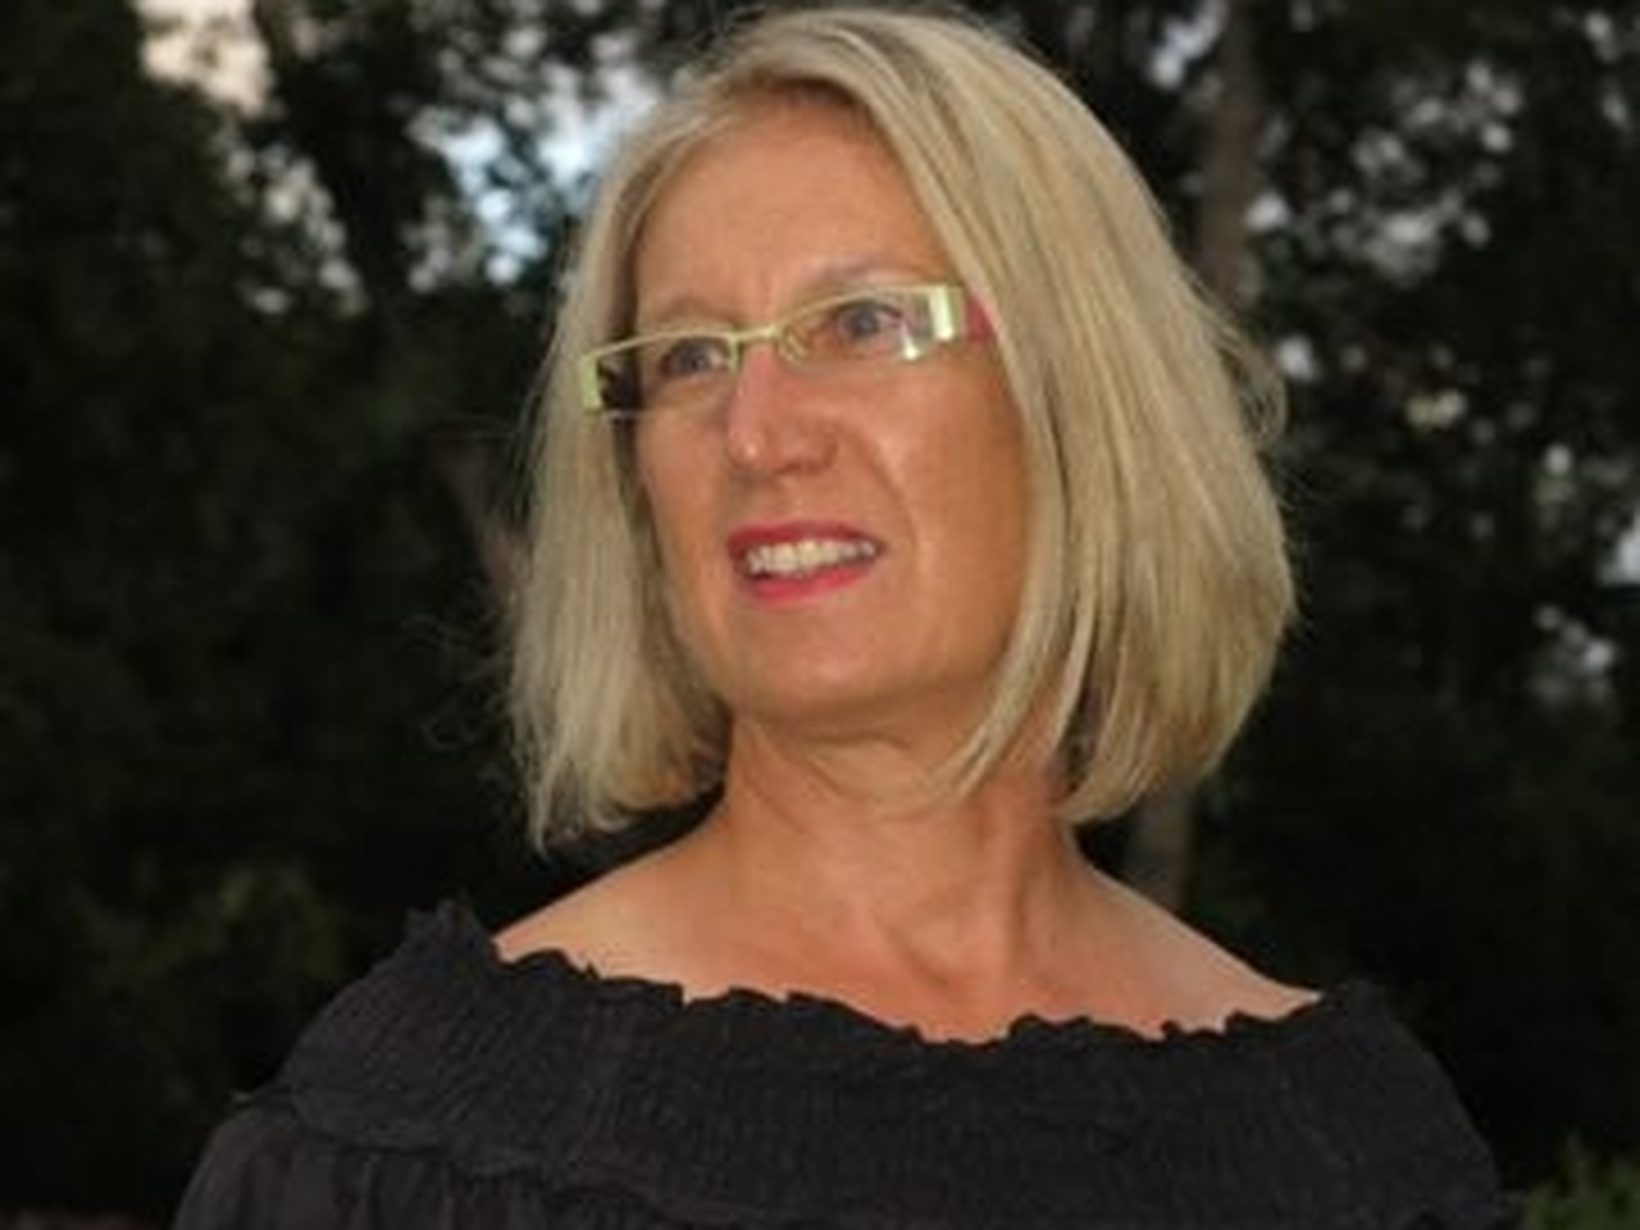 Deborah from Mosman, New South Wales, Australia